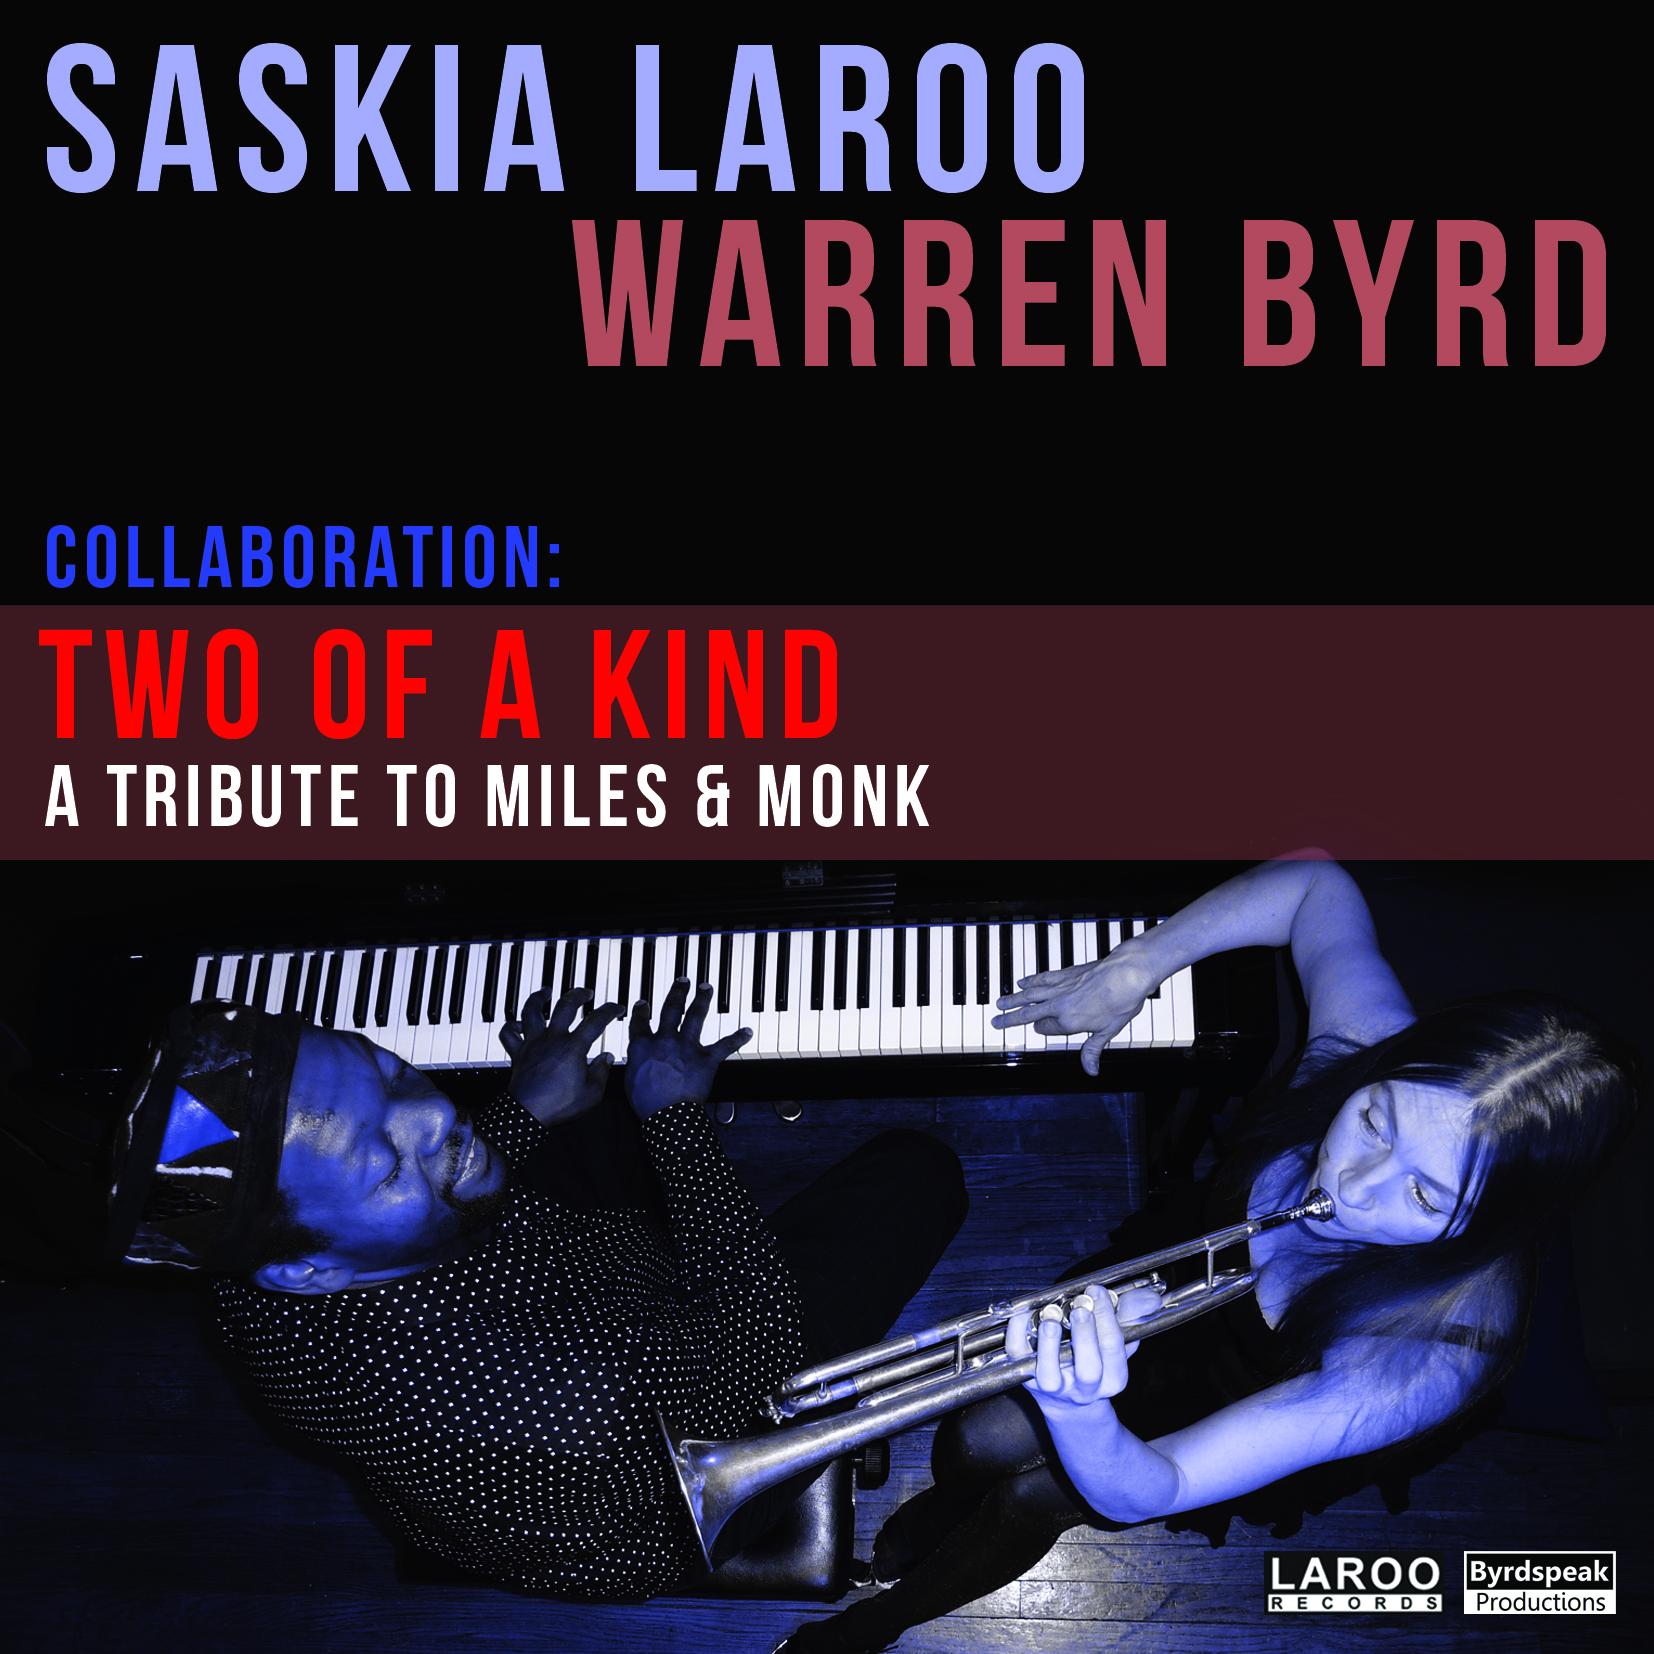 Saskia Laroo W Warren Byrd's Byrdspeak